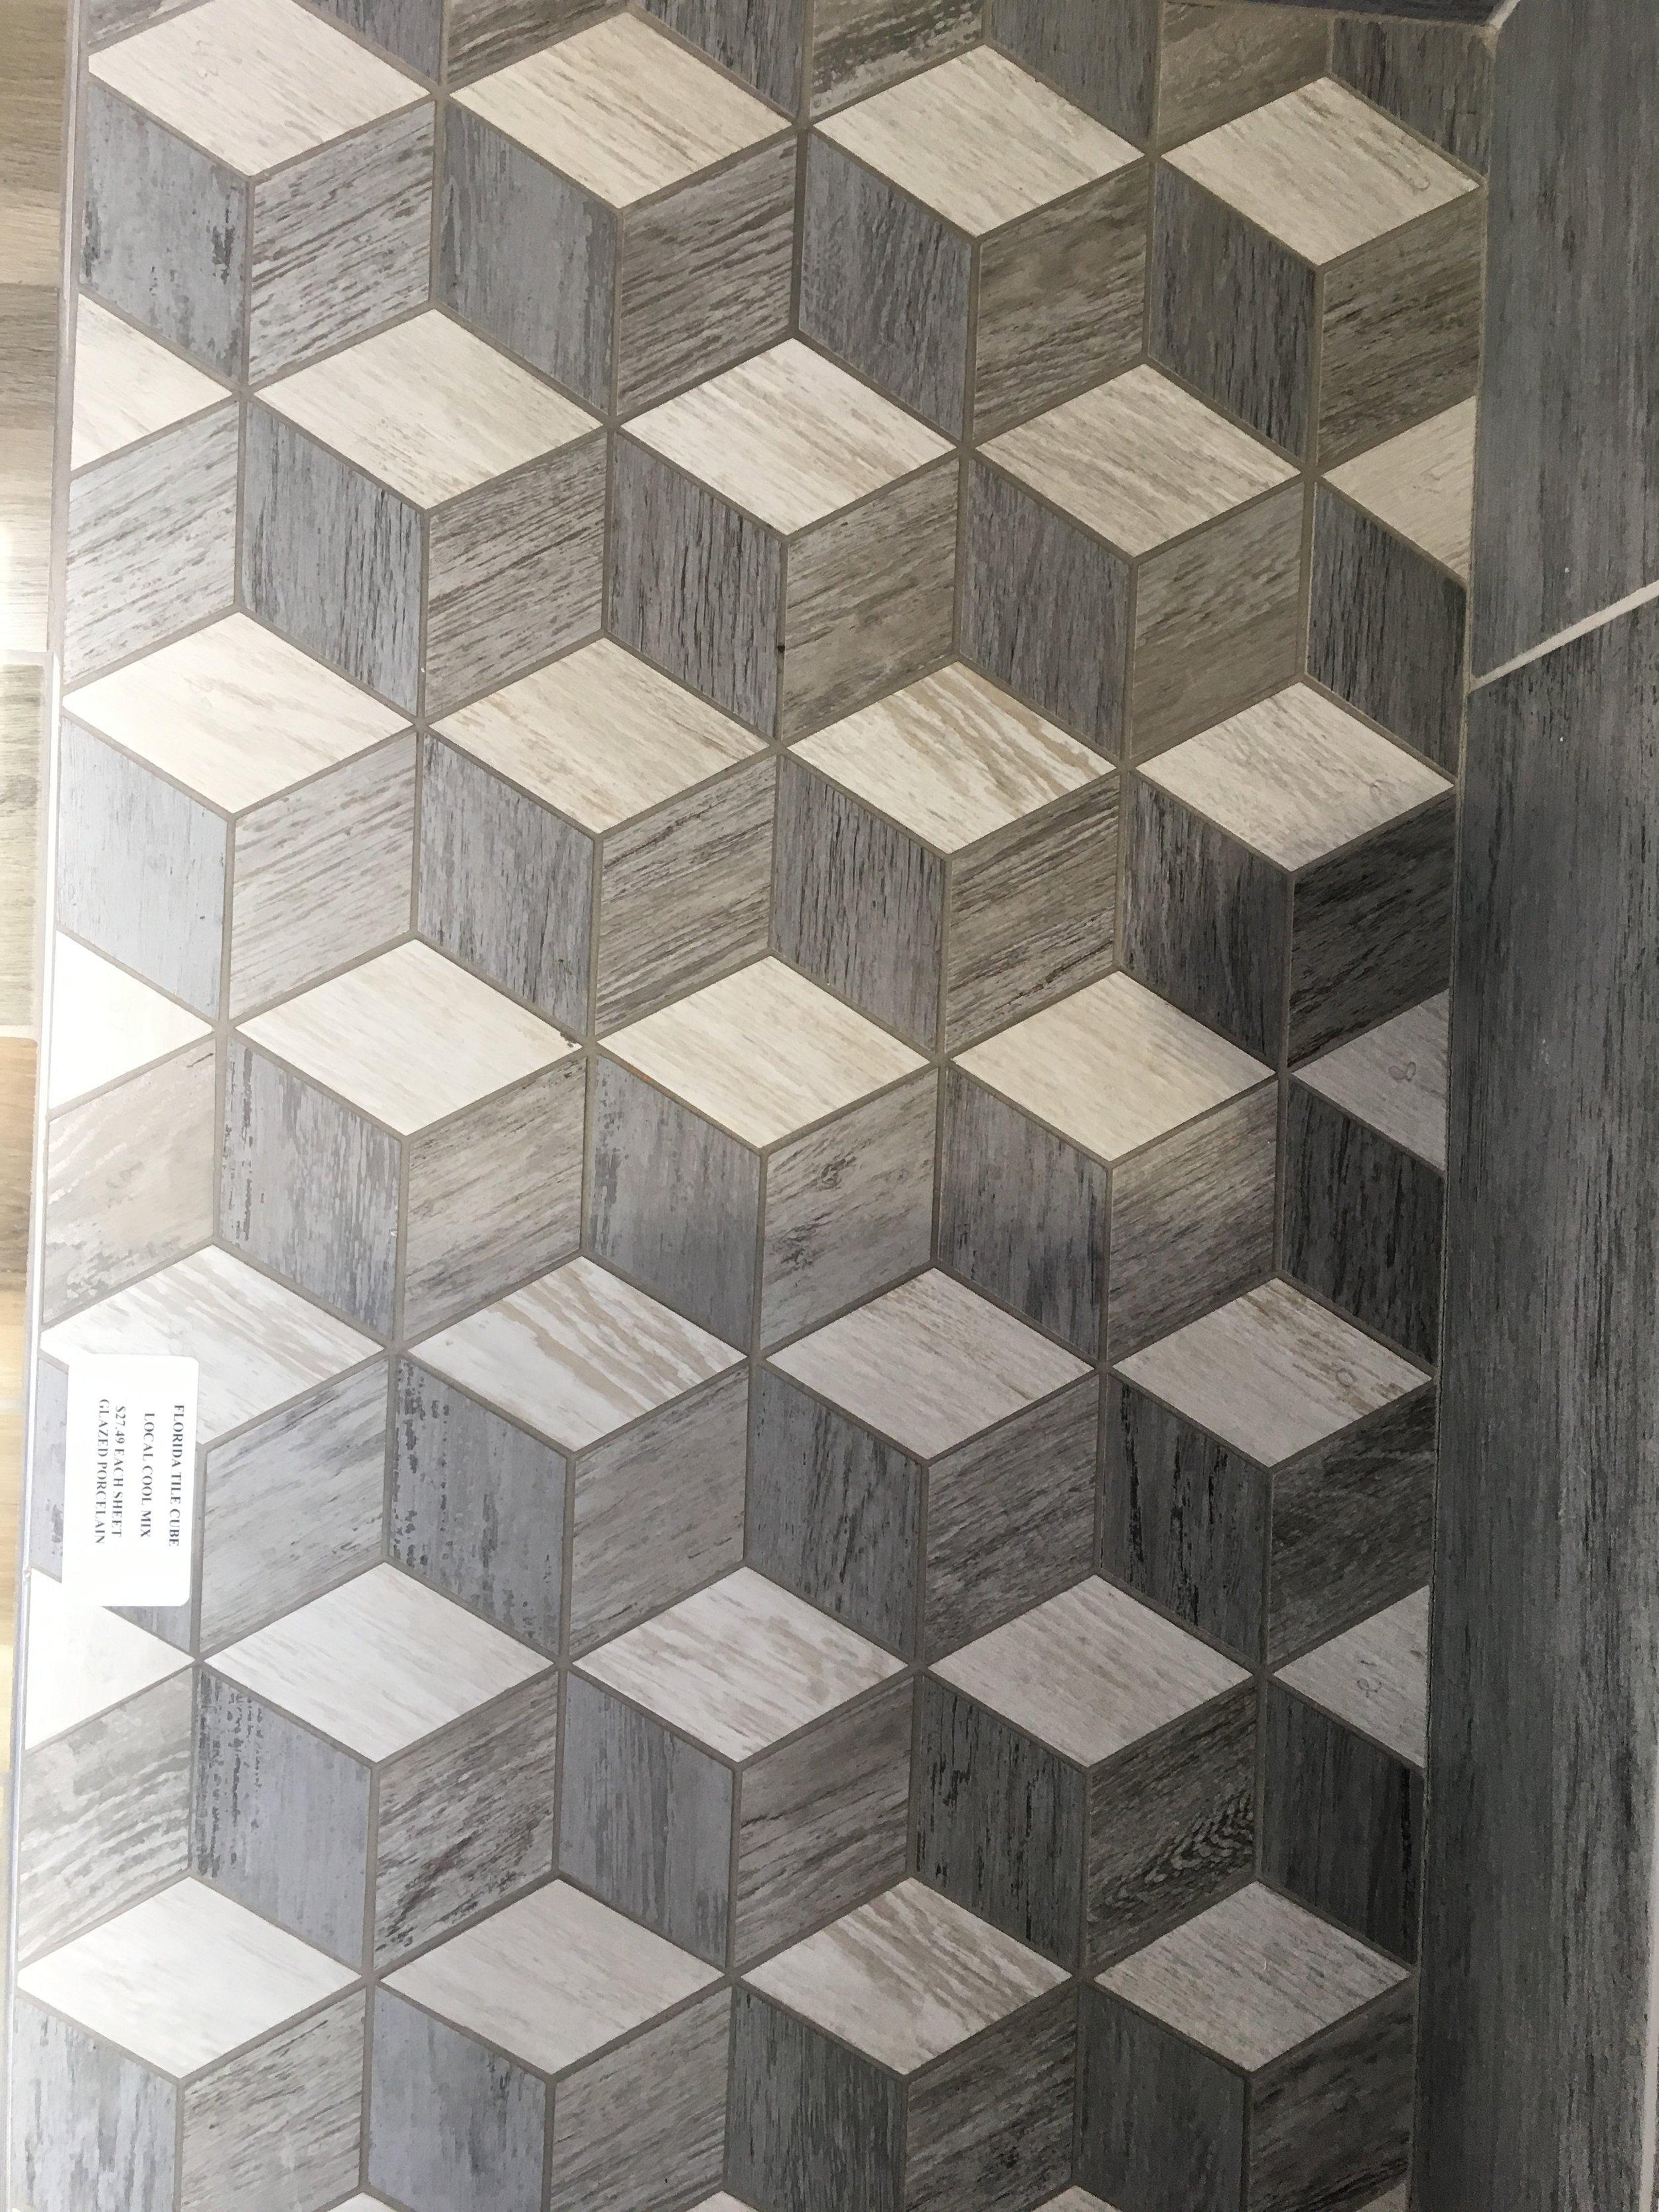 Fascinating optical illusion wood look porcelain tile